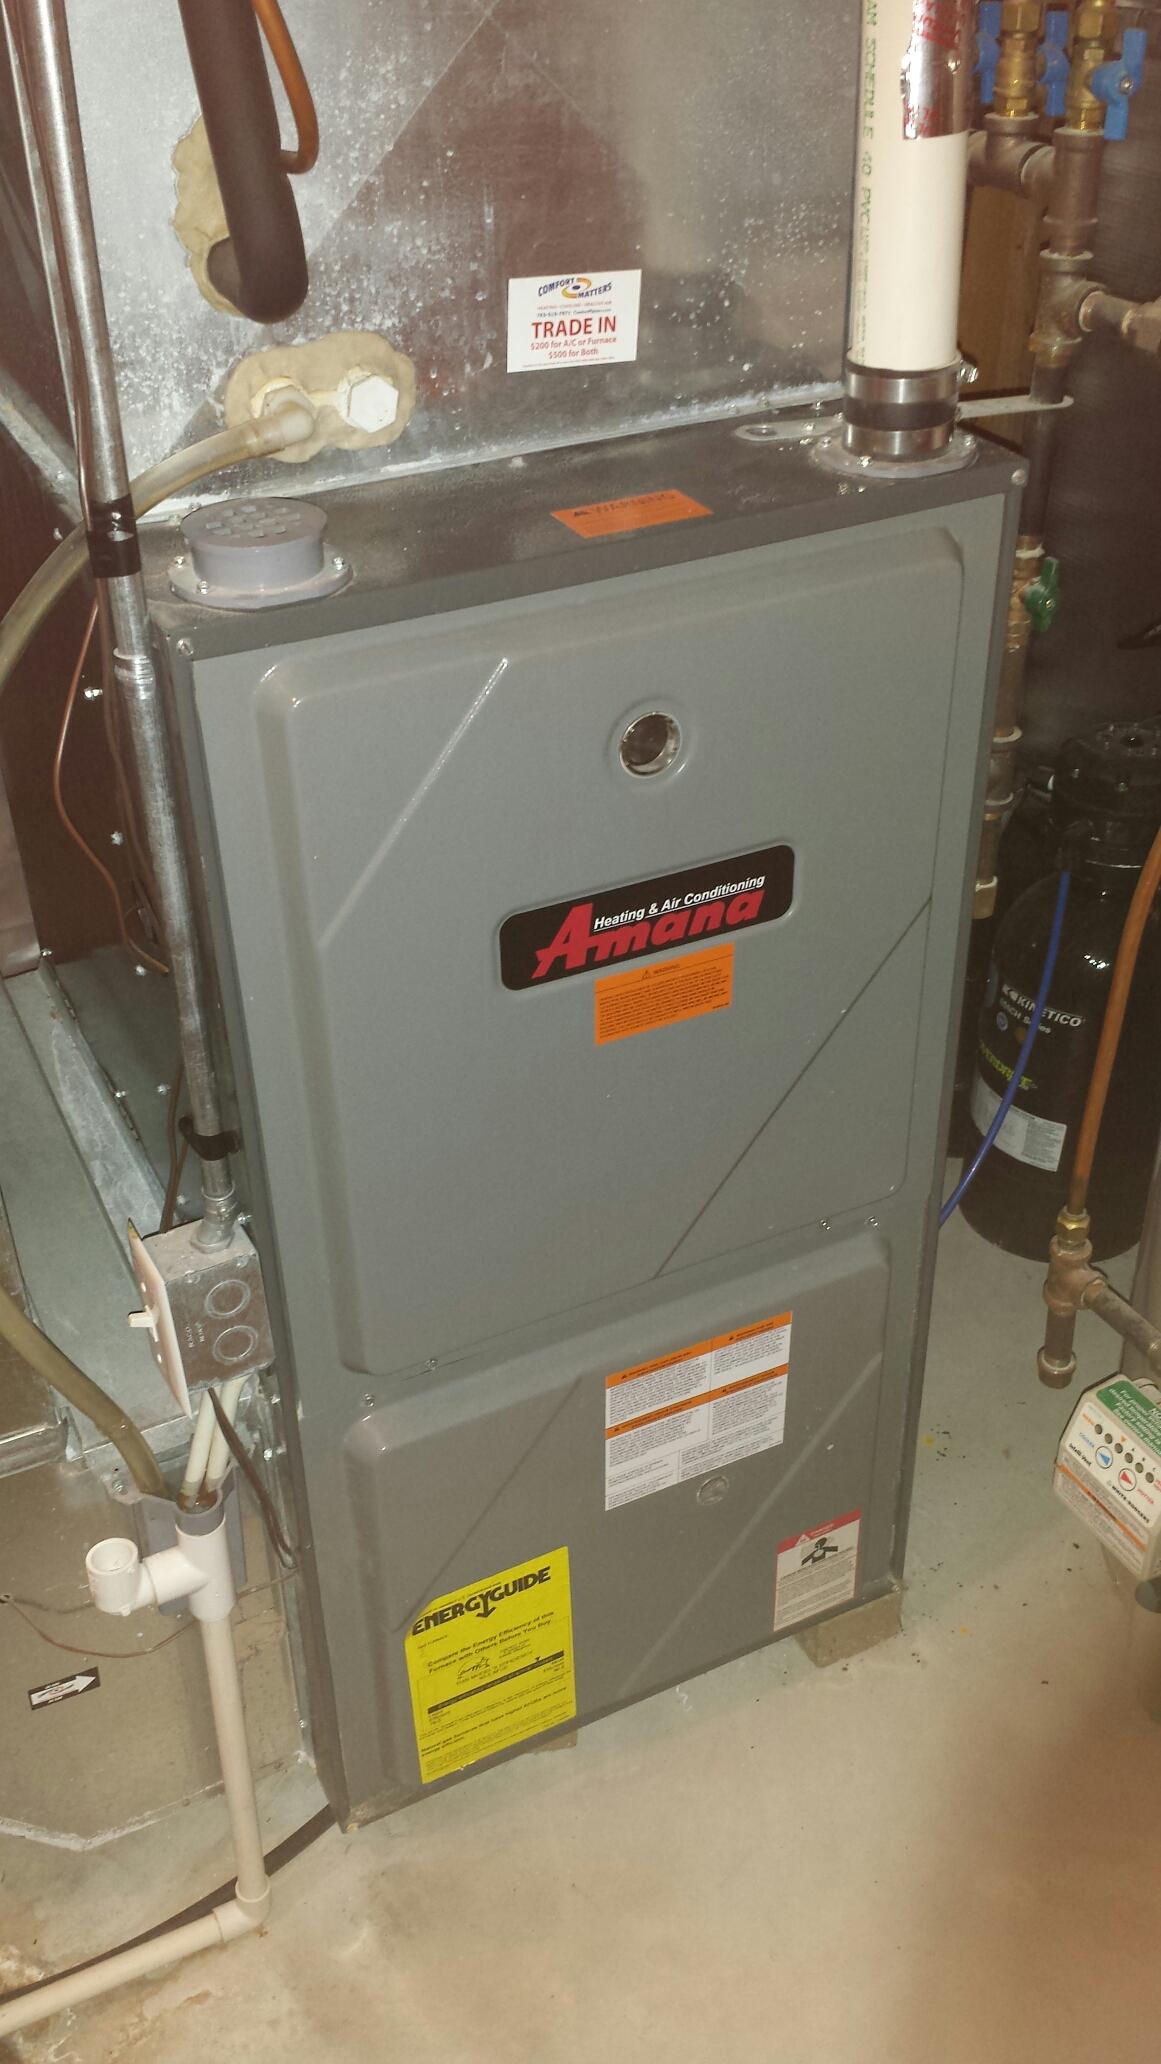 Watertown, MN - Heatimg service. Replaced an exhaust motor on an Amana furnace.